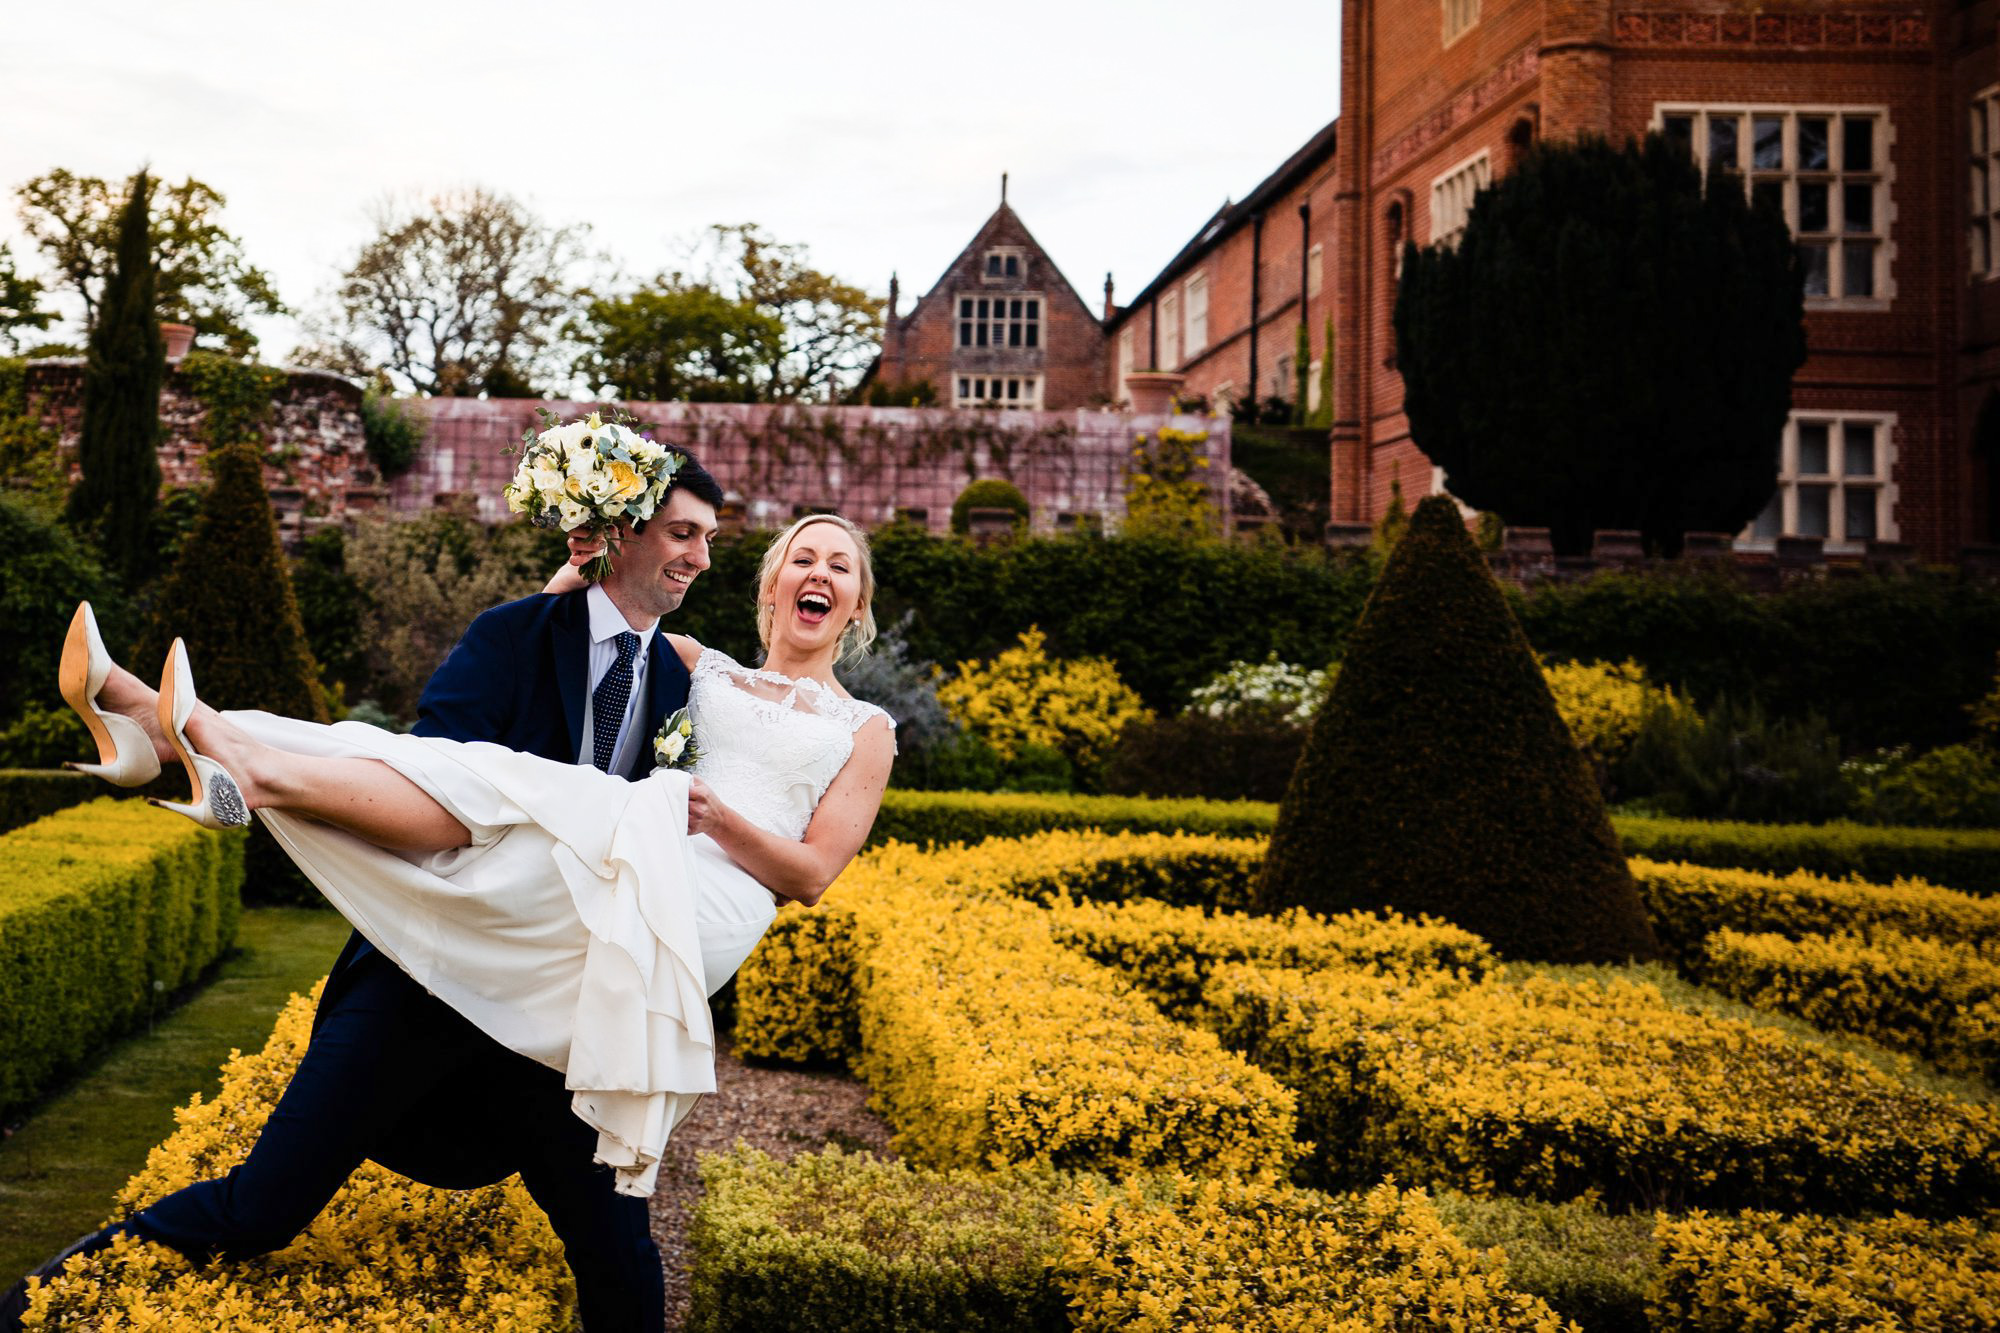 Bride and groom at Oxnead Hall